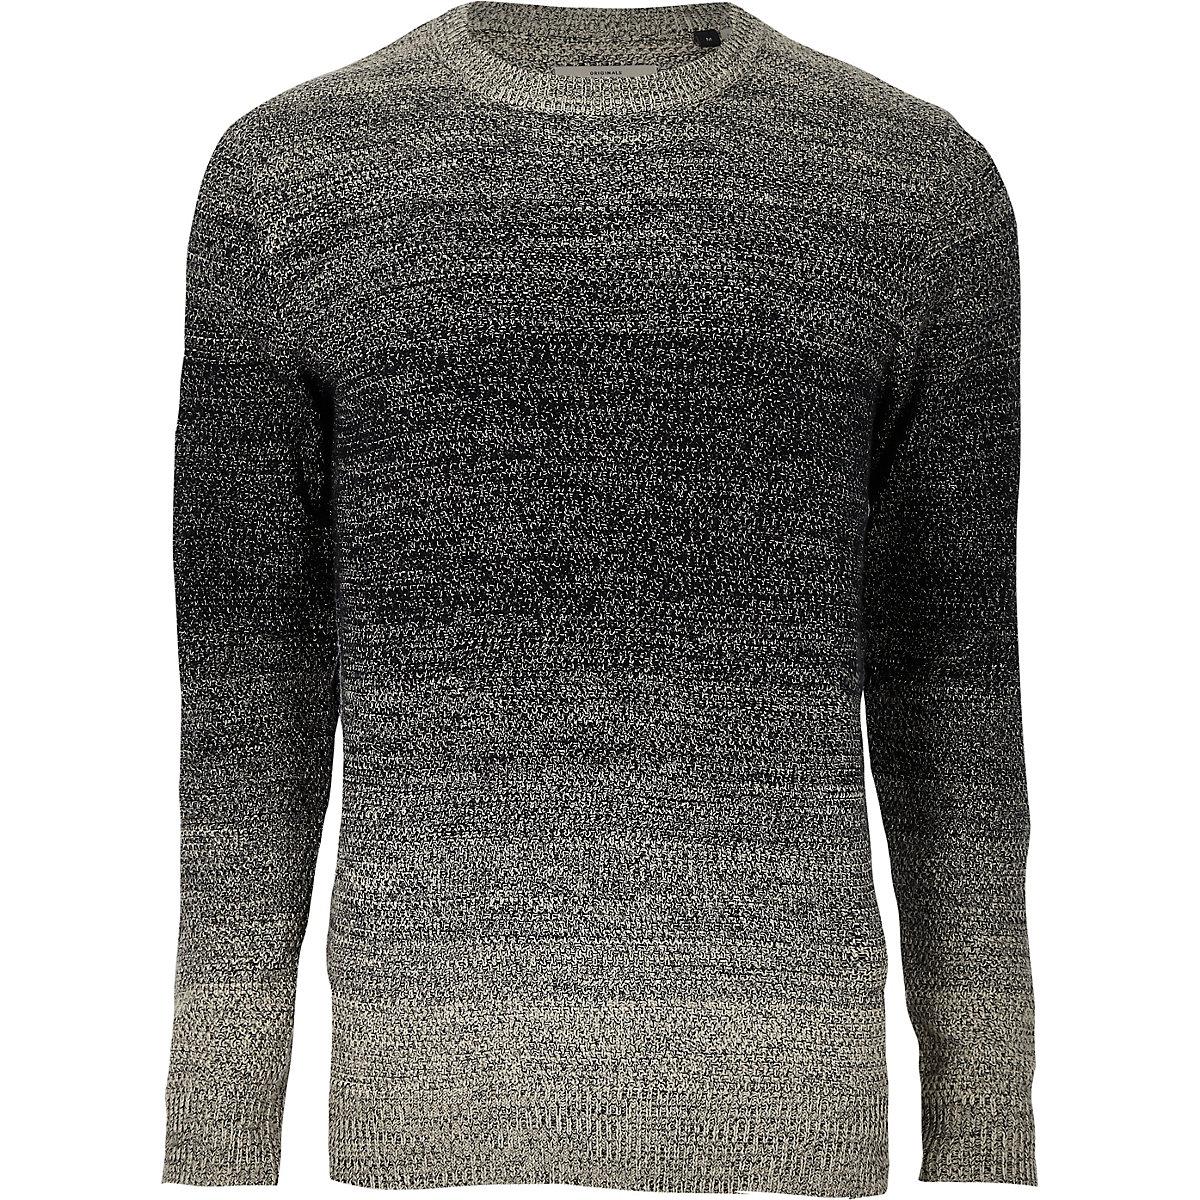 Jack & Jones Originals navy knit sweater